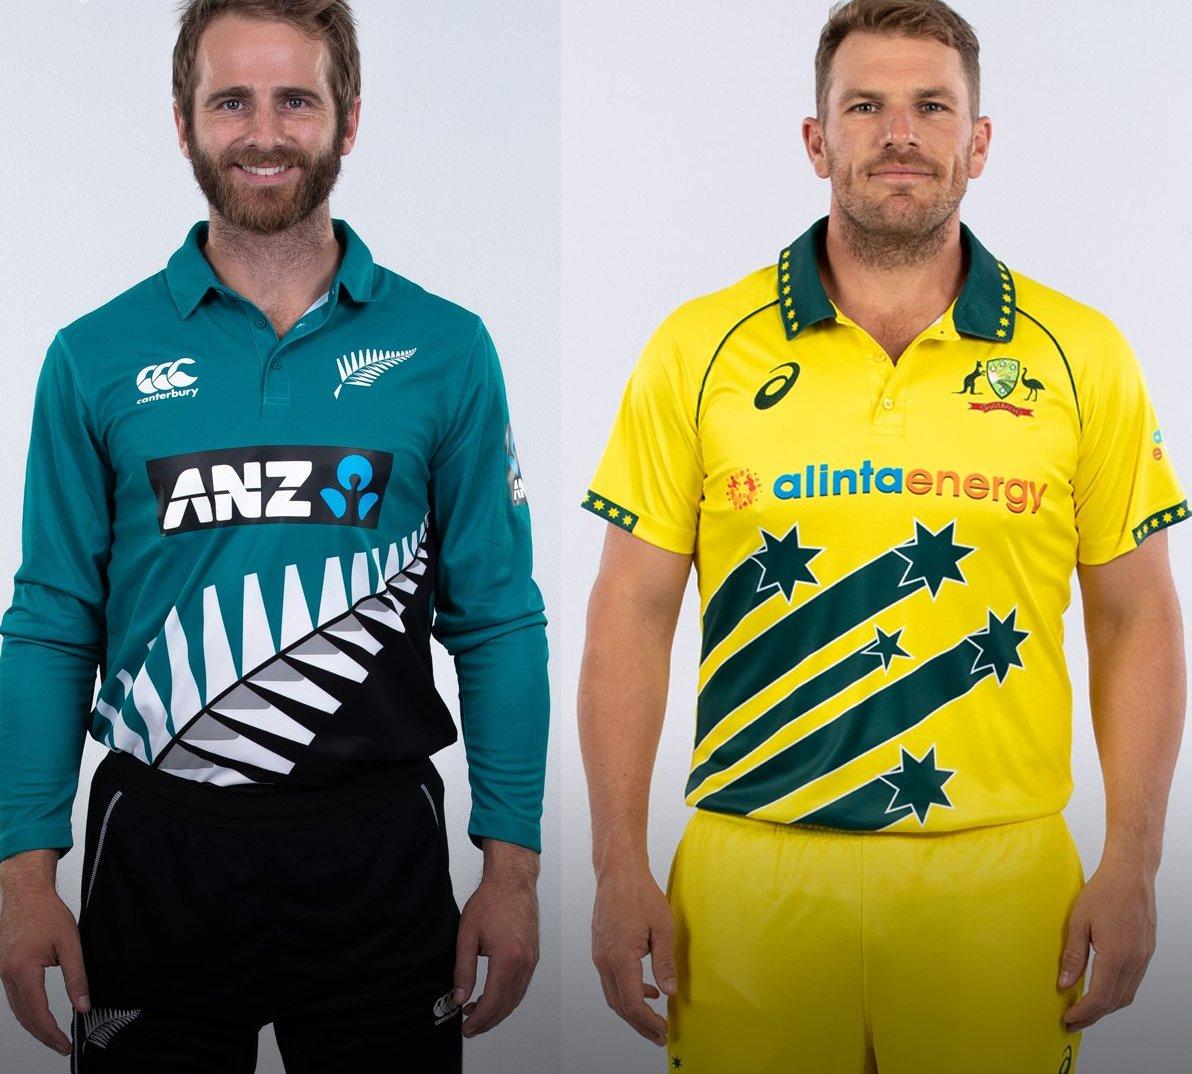 Aus V Nz 2020 In Pics New Zealand Cricketers Sport Retro Jersey Ahead Of Australia Odi Series